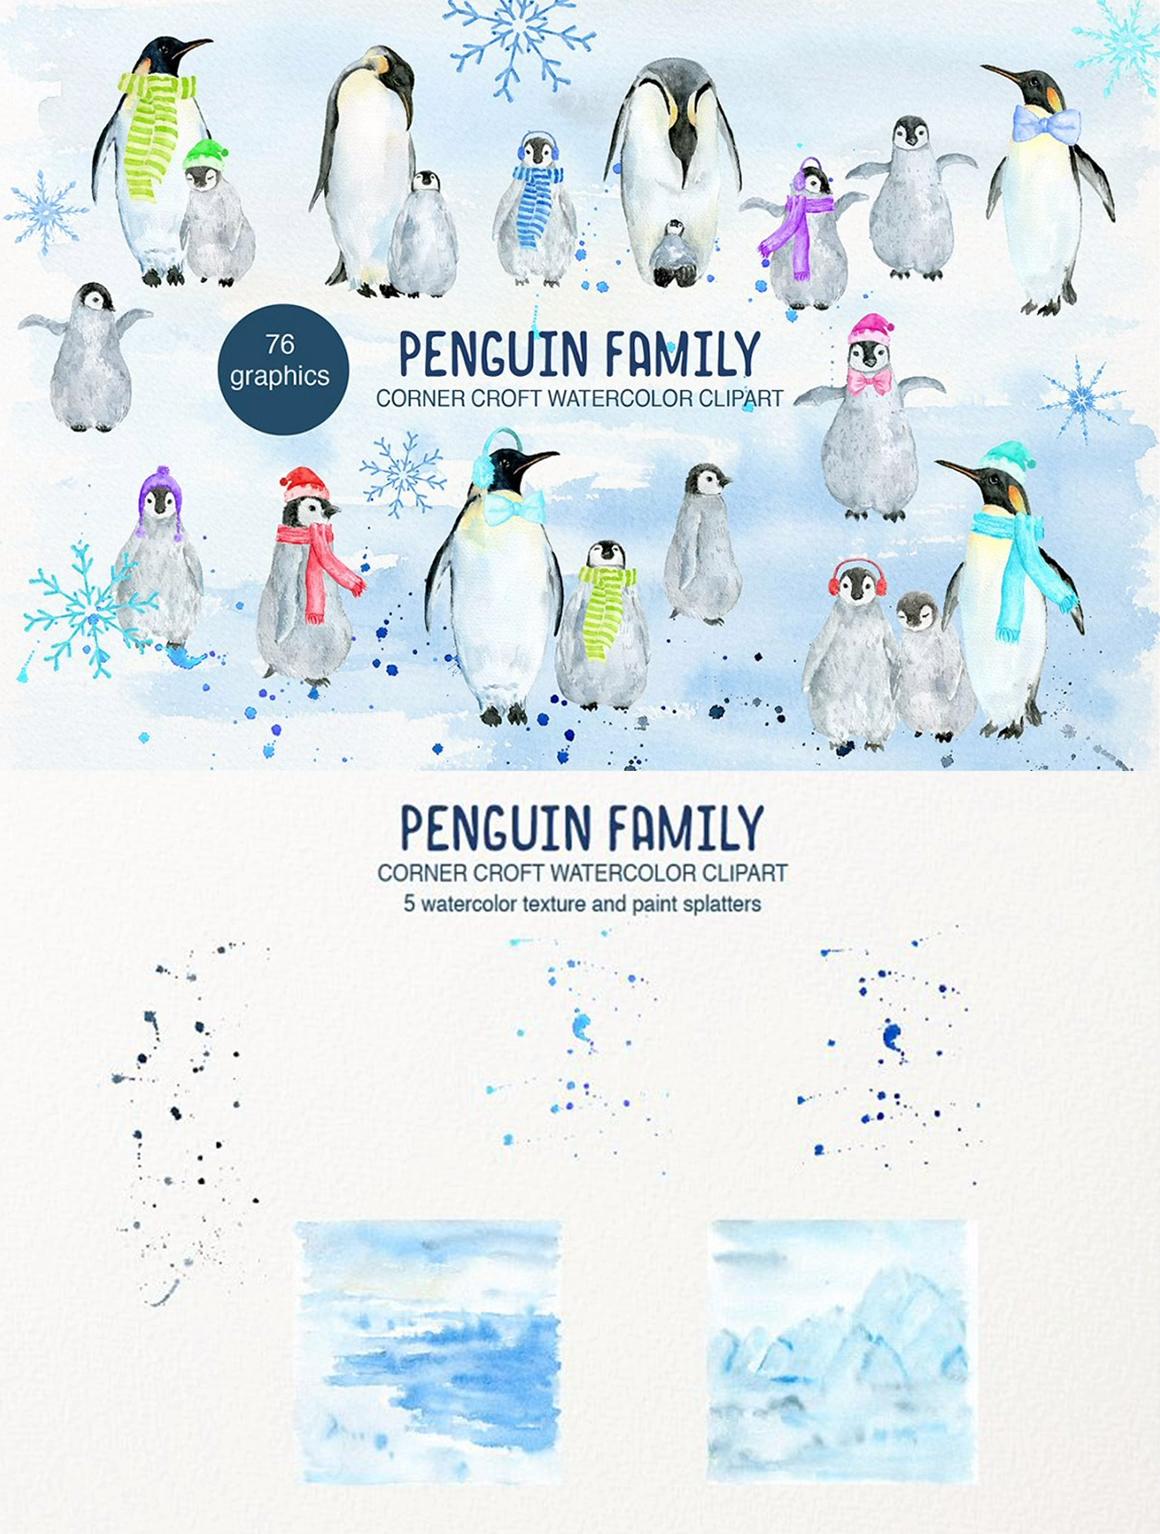 Watercolor Penguin Family Illustration Penguin Clipart 138280 Illustrations Design Bundles Video Video Penguin Illustration Family Illustration Clip Art